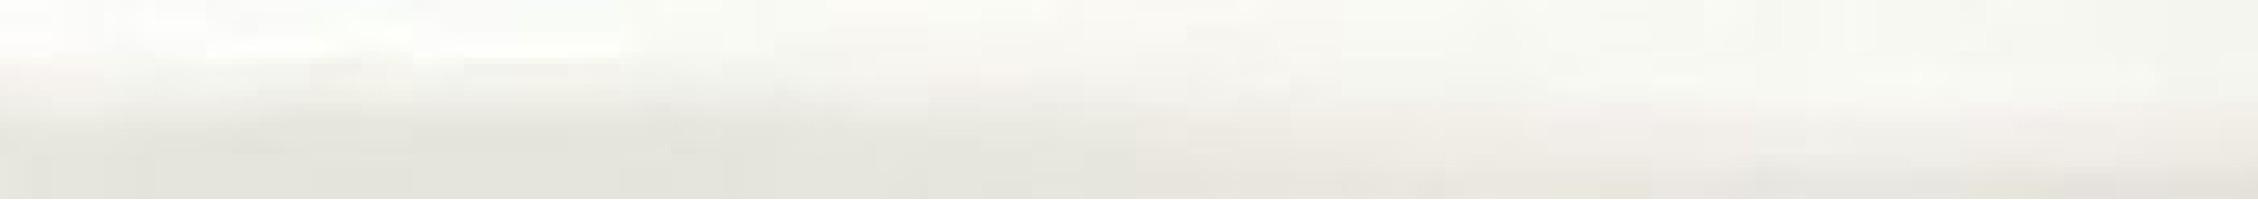 Бордюр Ocean Gloss White 2.5x30 Ribesalbes Ceramica